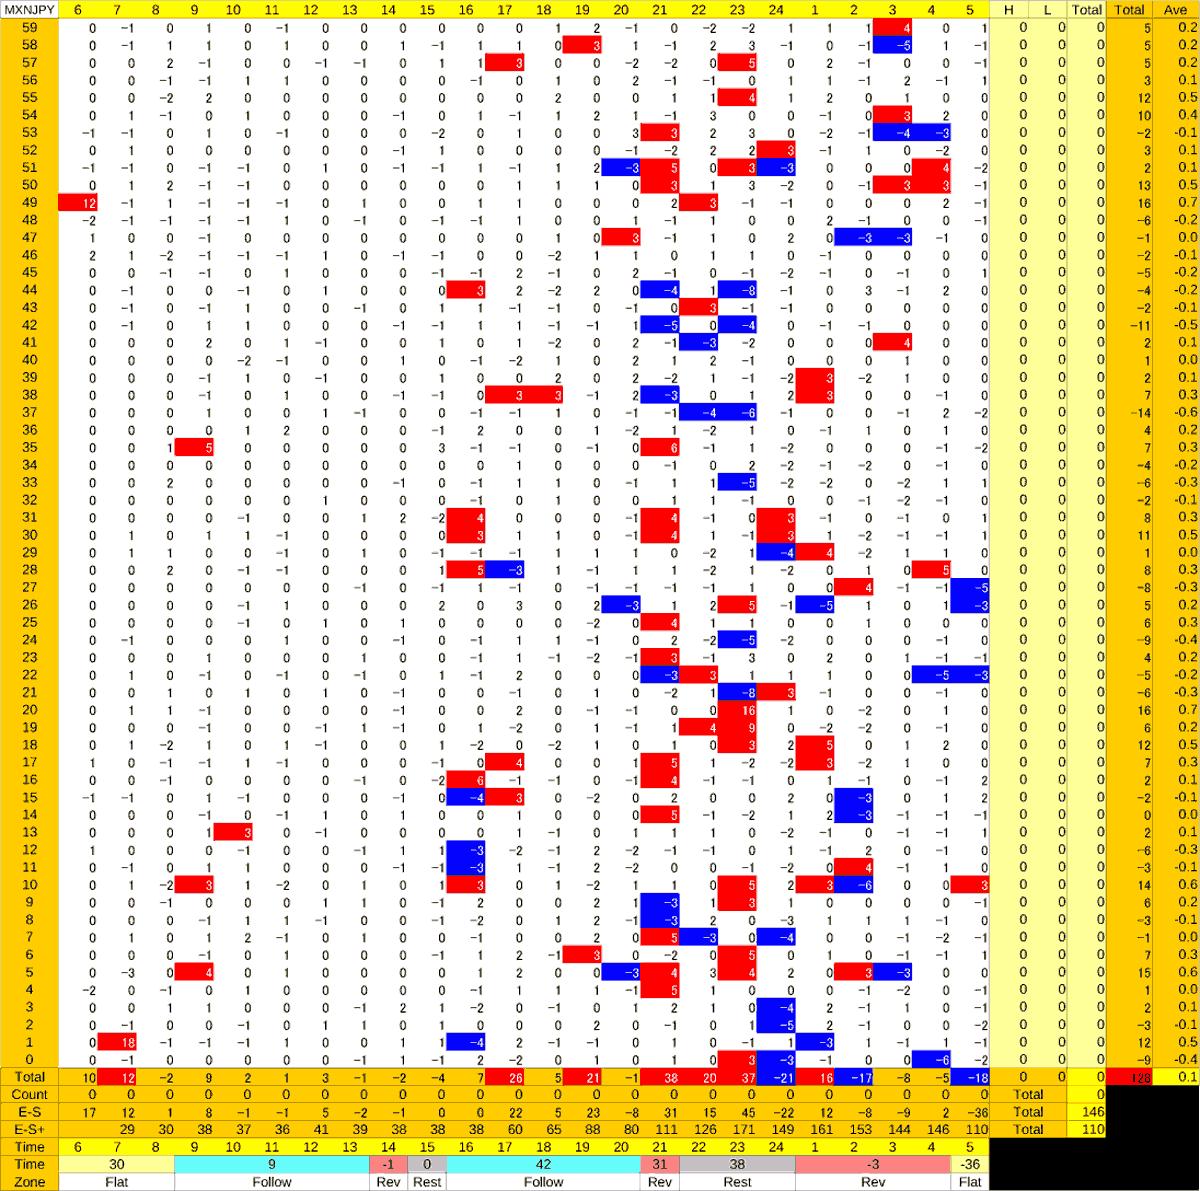 20200602_HS(3)MXNJPY